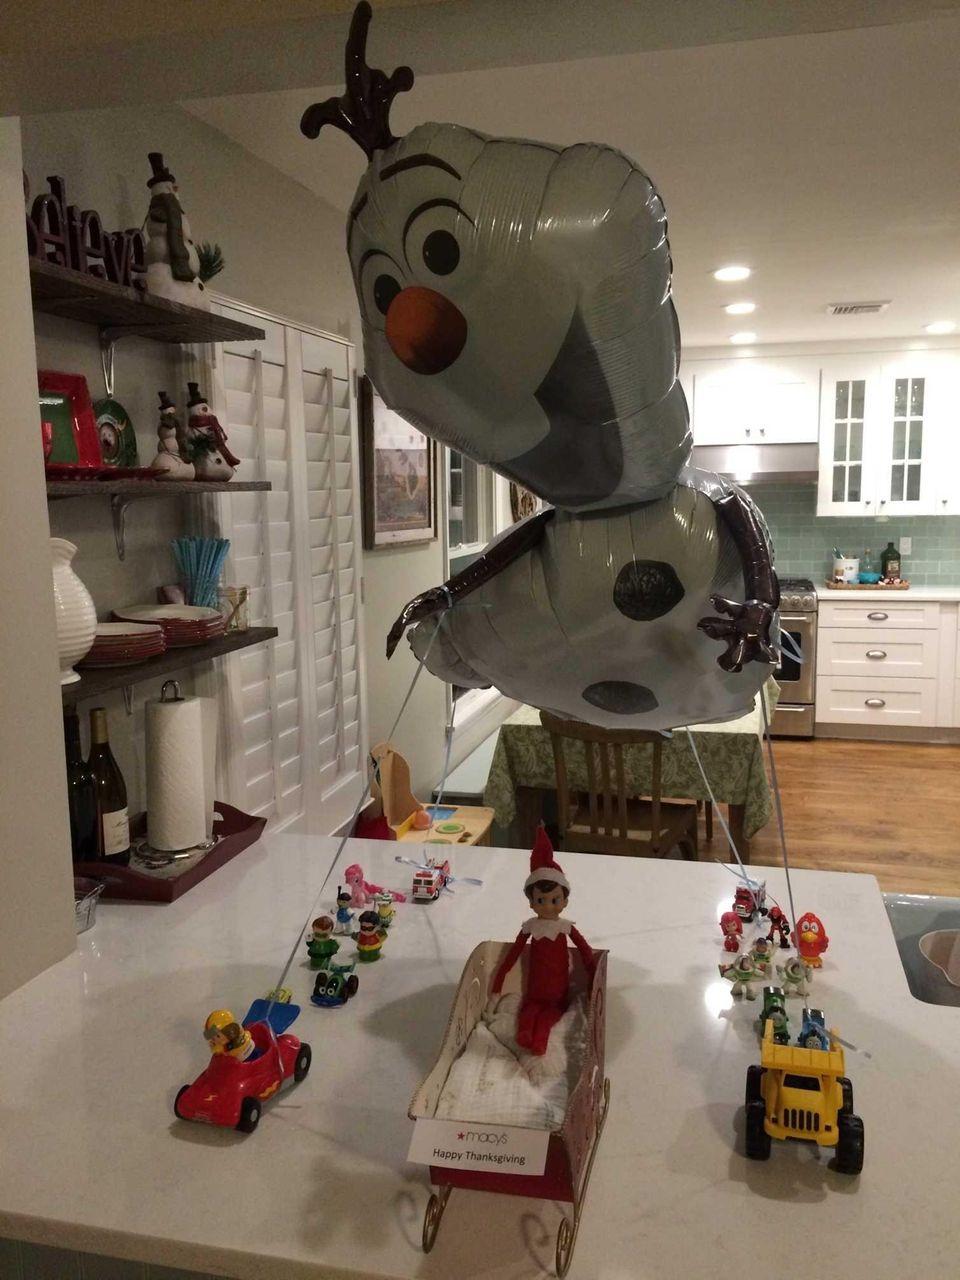 The Most Creative Elf On The Shelf Ideas Newsday